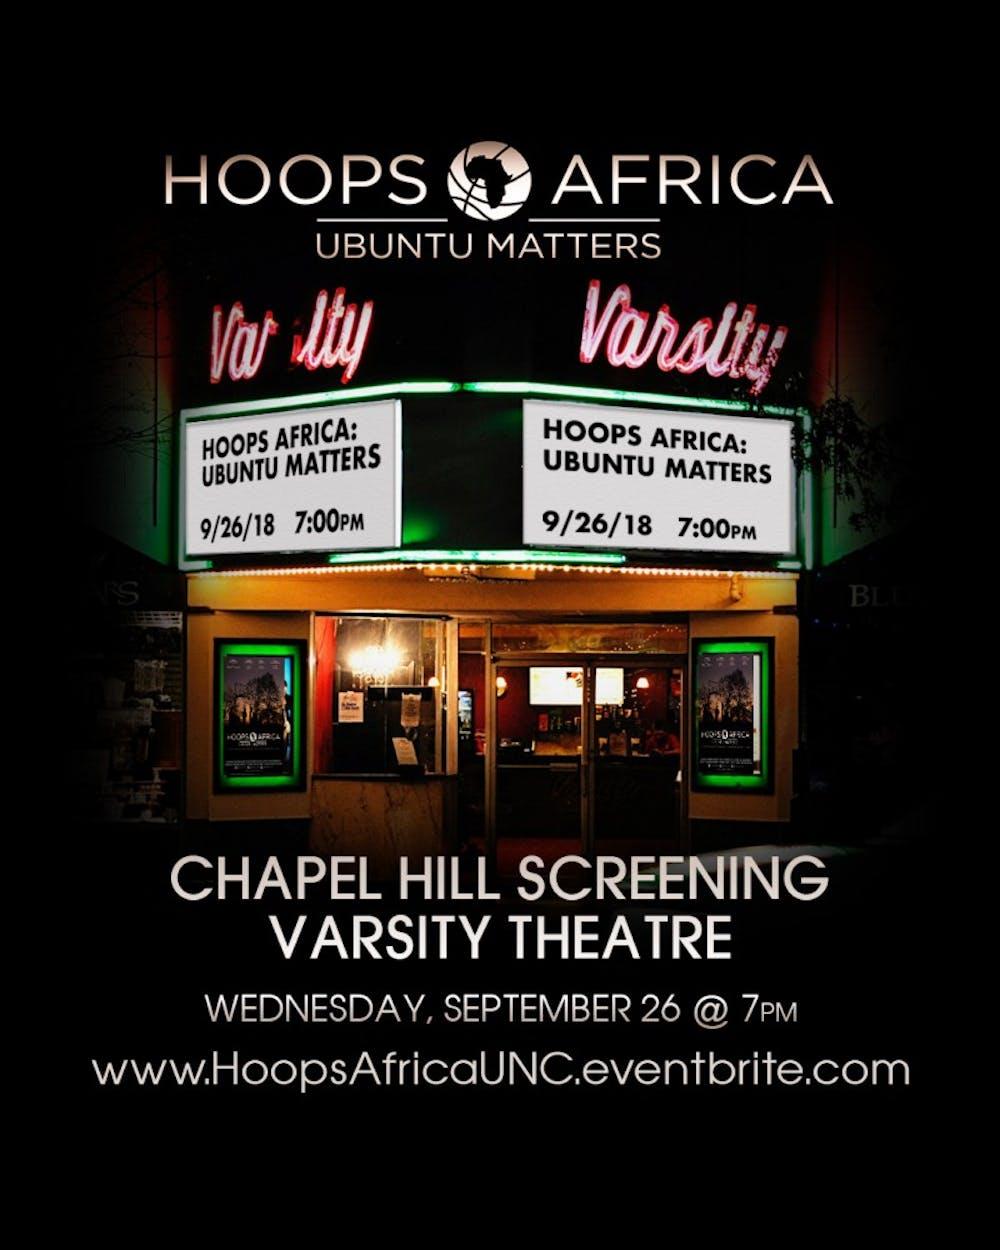 UNC alum Taylor Sharp talks directing Hoops Africa: Ubuntu Matters documentary